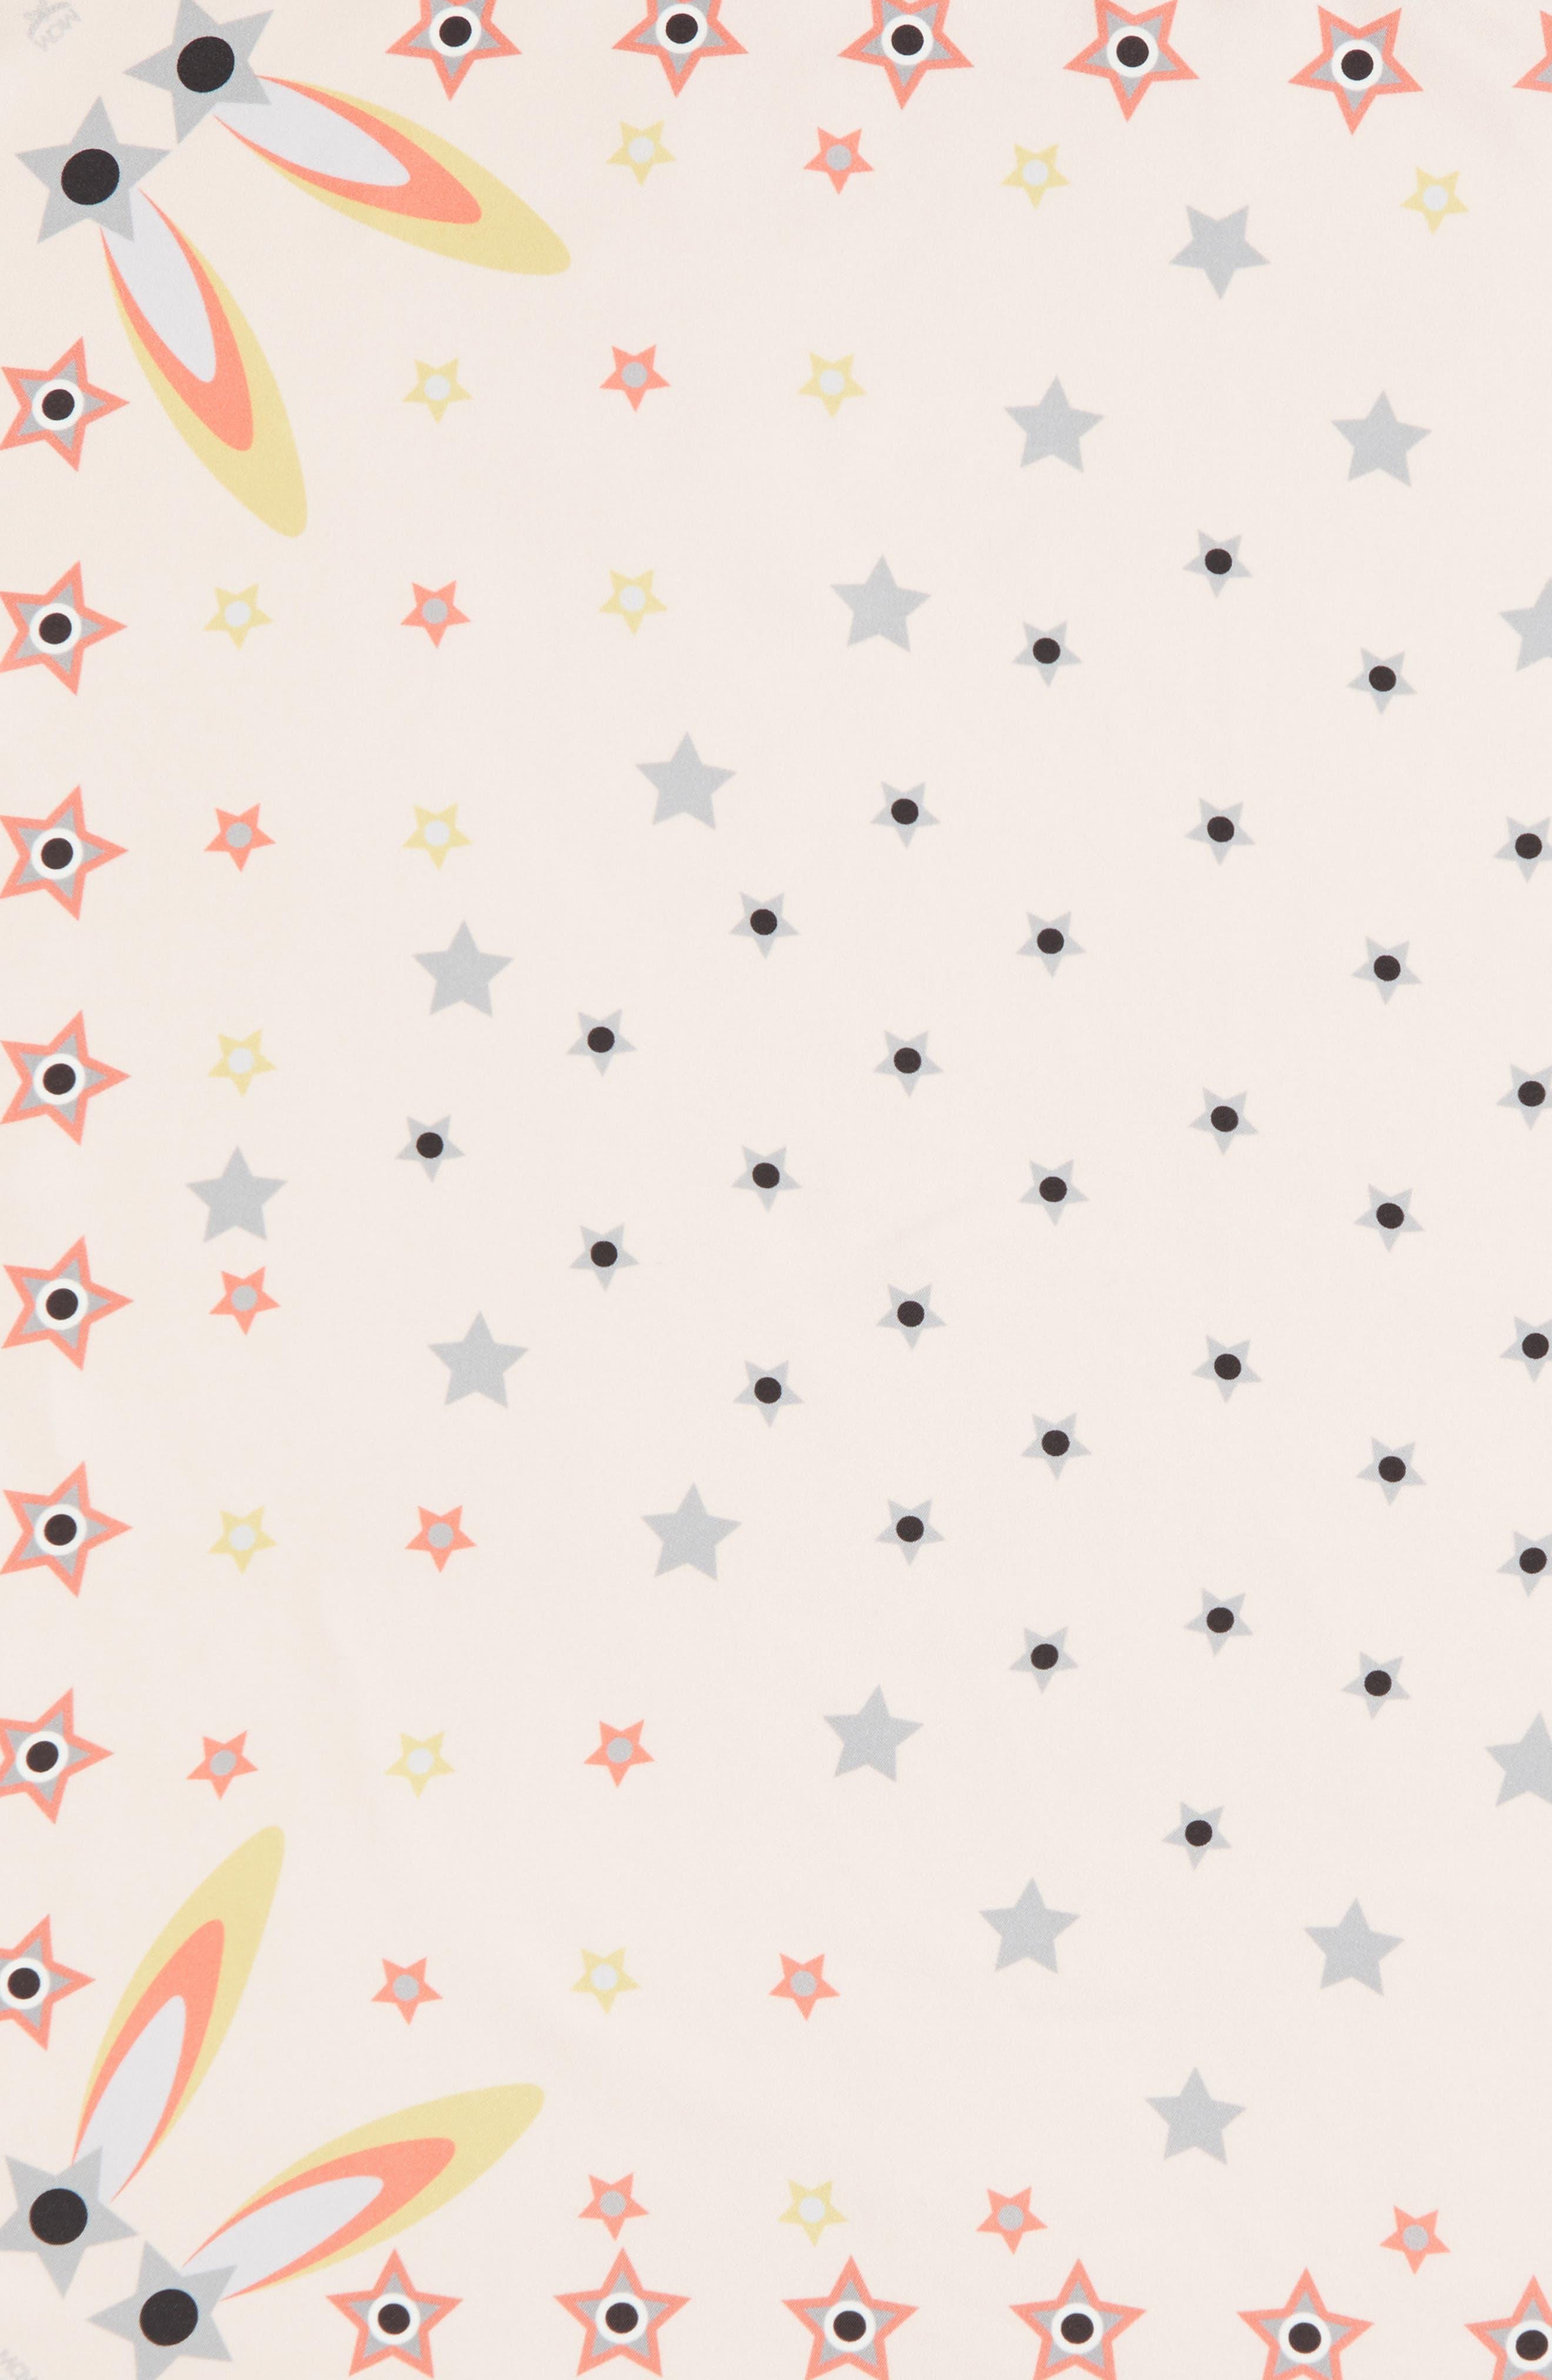 Star-Eyed Bunny Silk Scarf,                             Alternate thumbnail 8, color,